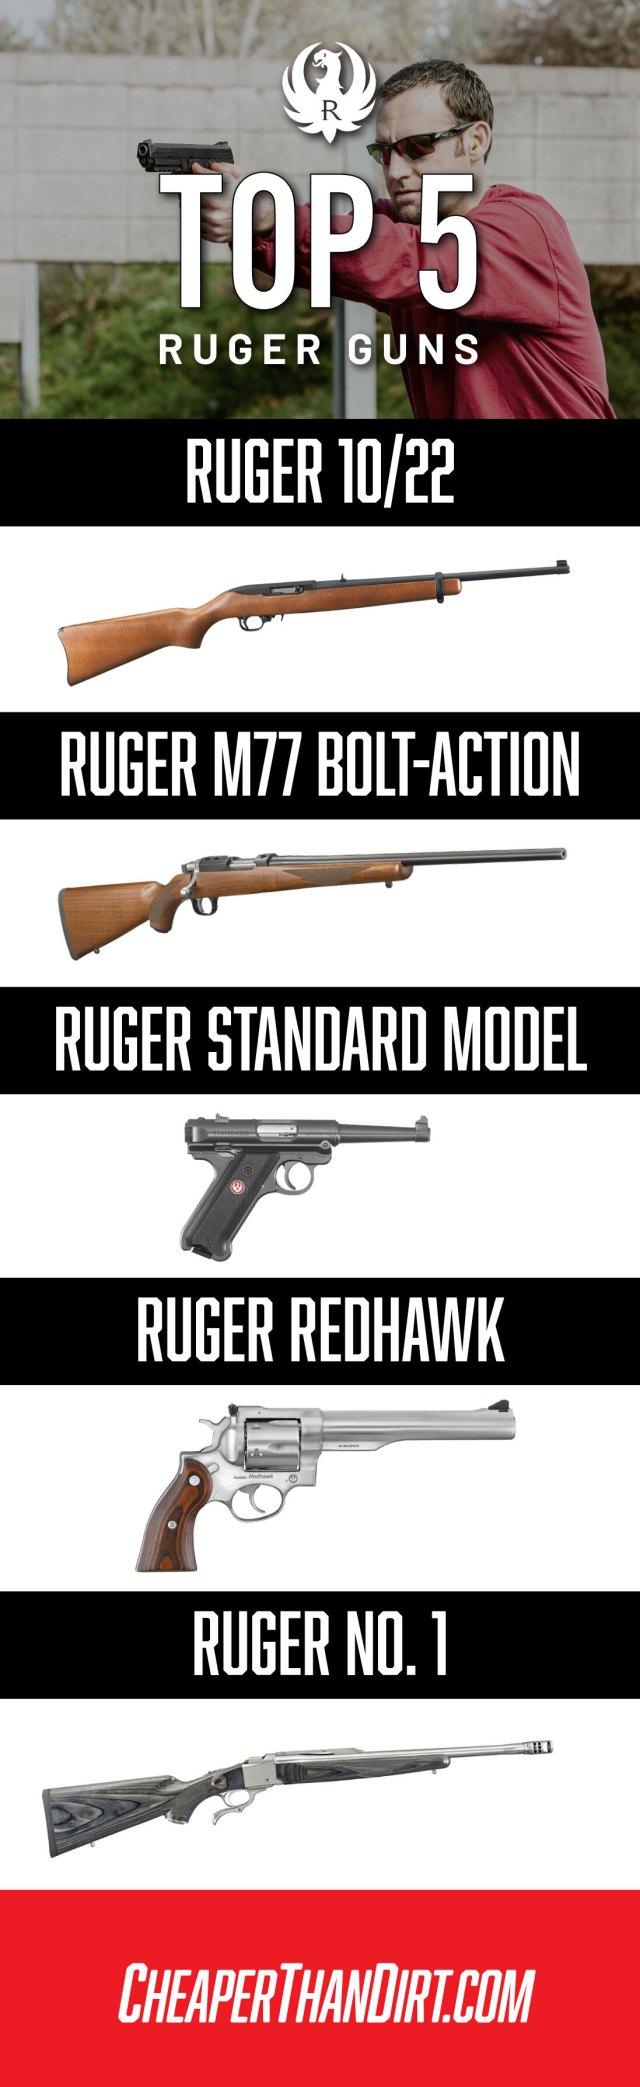 top 5 ruger guns